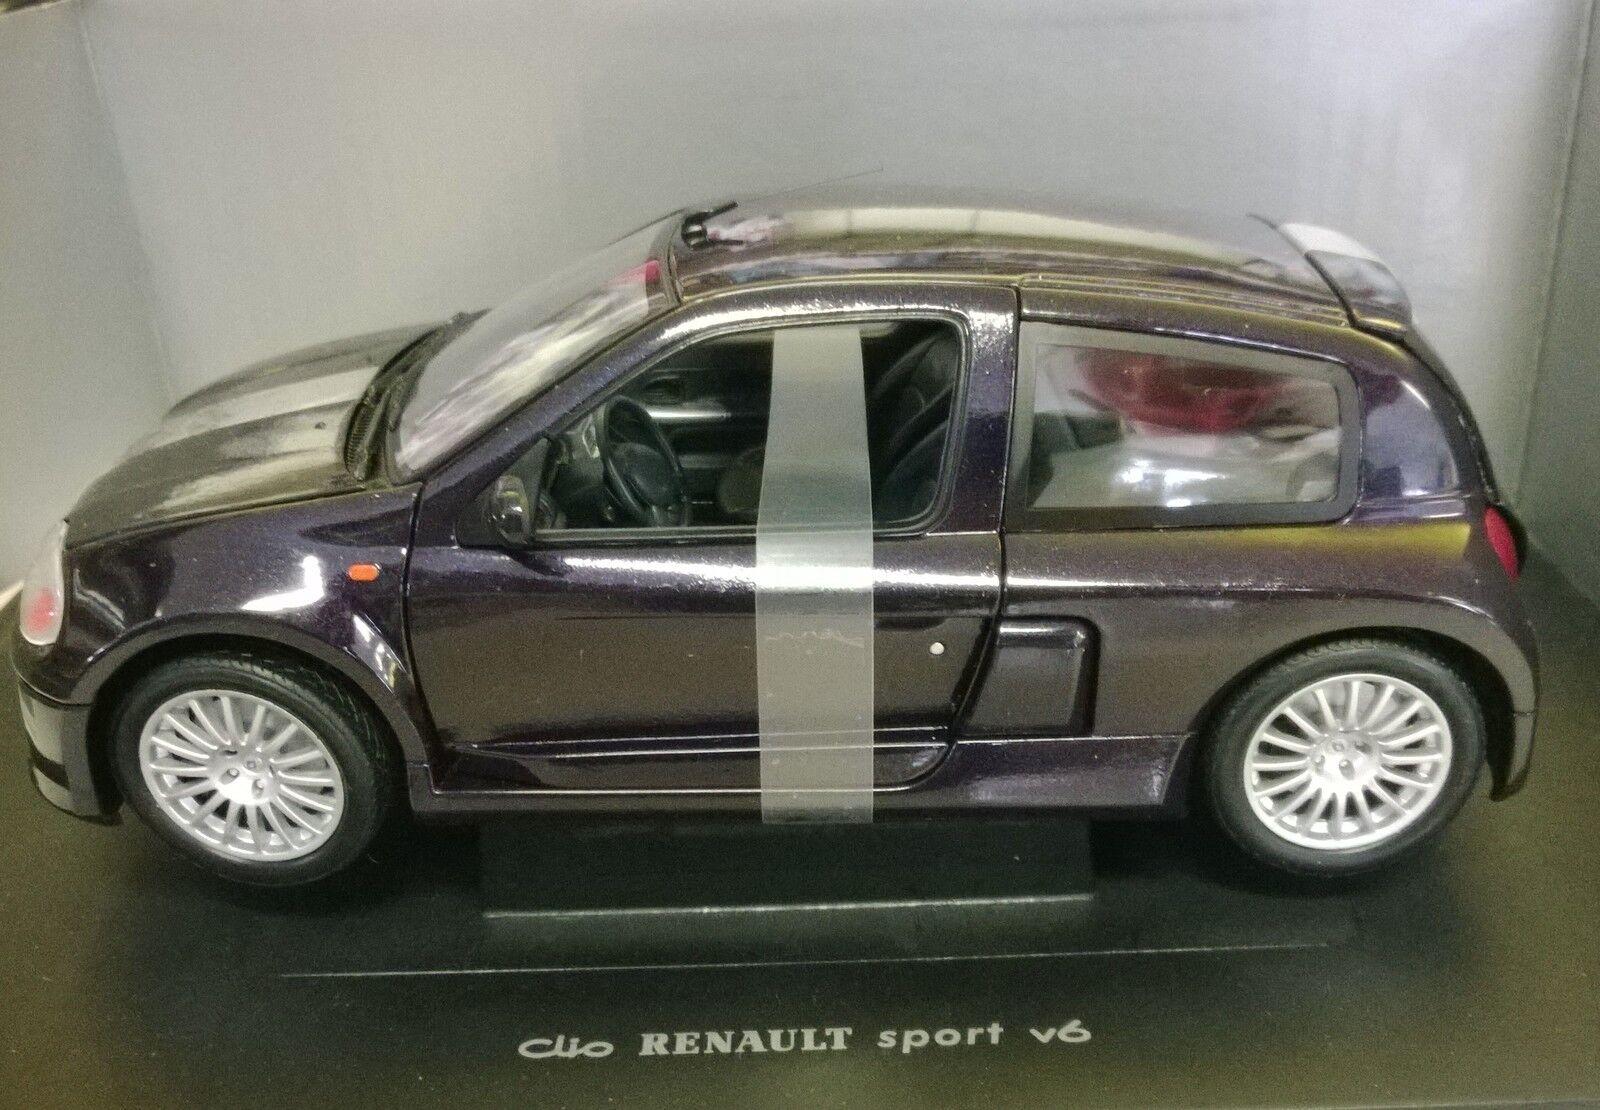 UNIVERSAL HOBBIES 1 18 AUTO DIE CAST RENAULT CLIO SPORT V6 VIOLA viola ART 4502